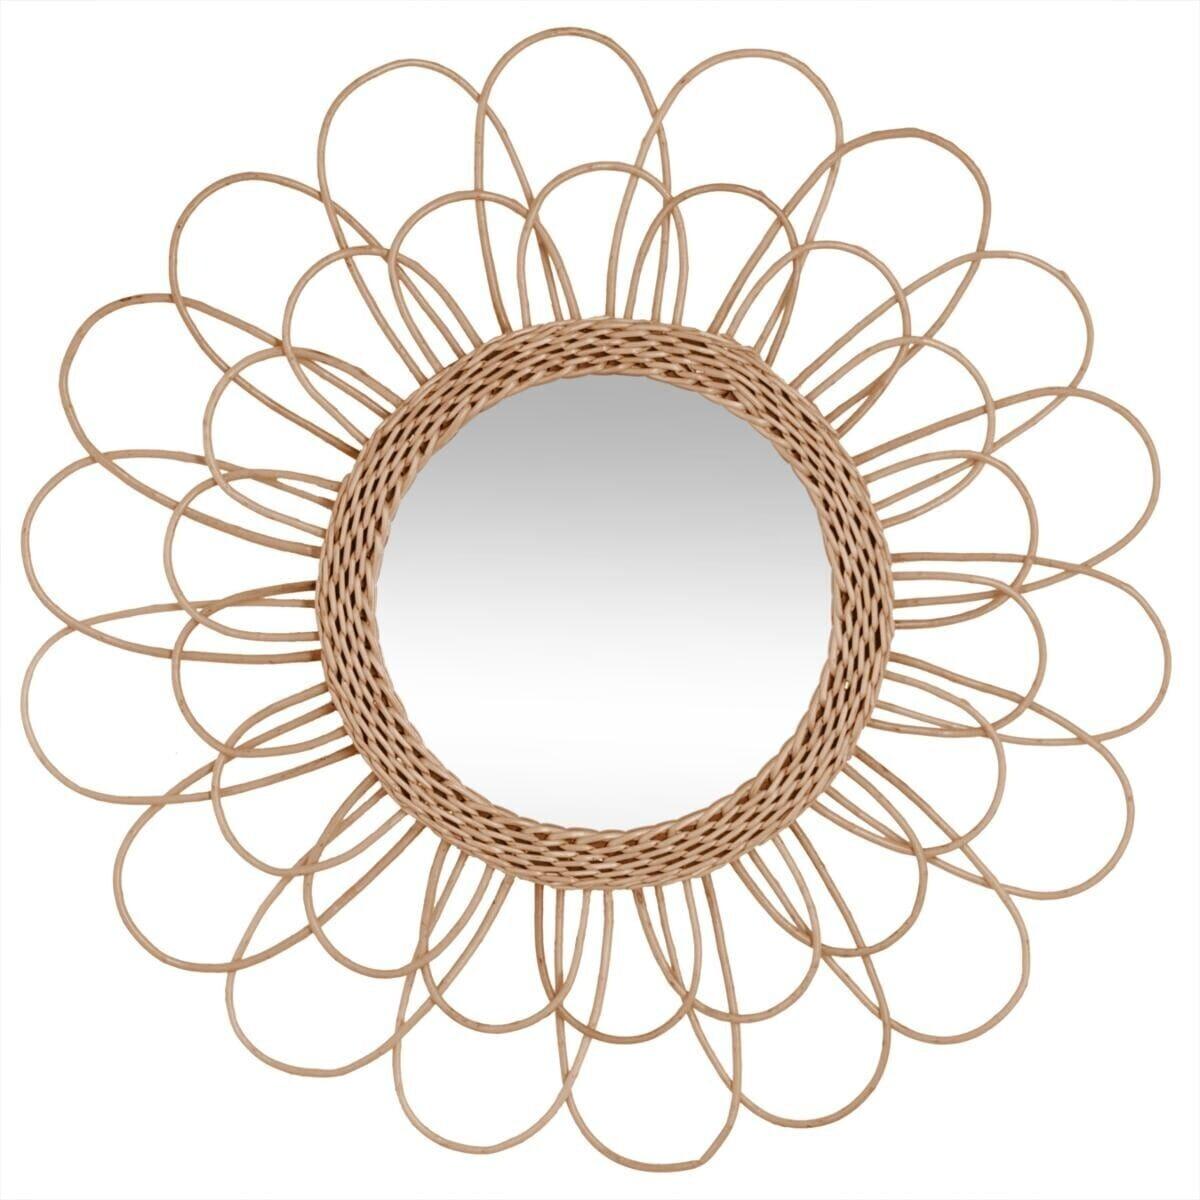 miroir fleur en rotin d56 atmosphera. Black Bedroom Furniture Sets. Home Design Ideas